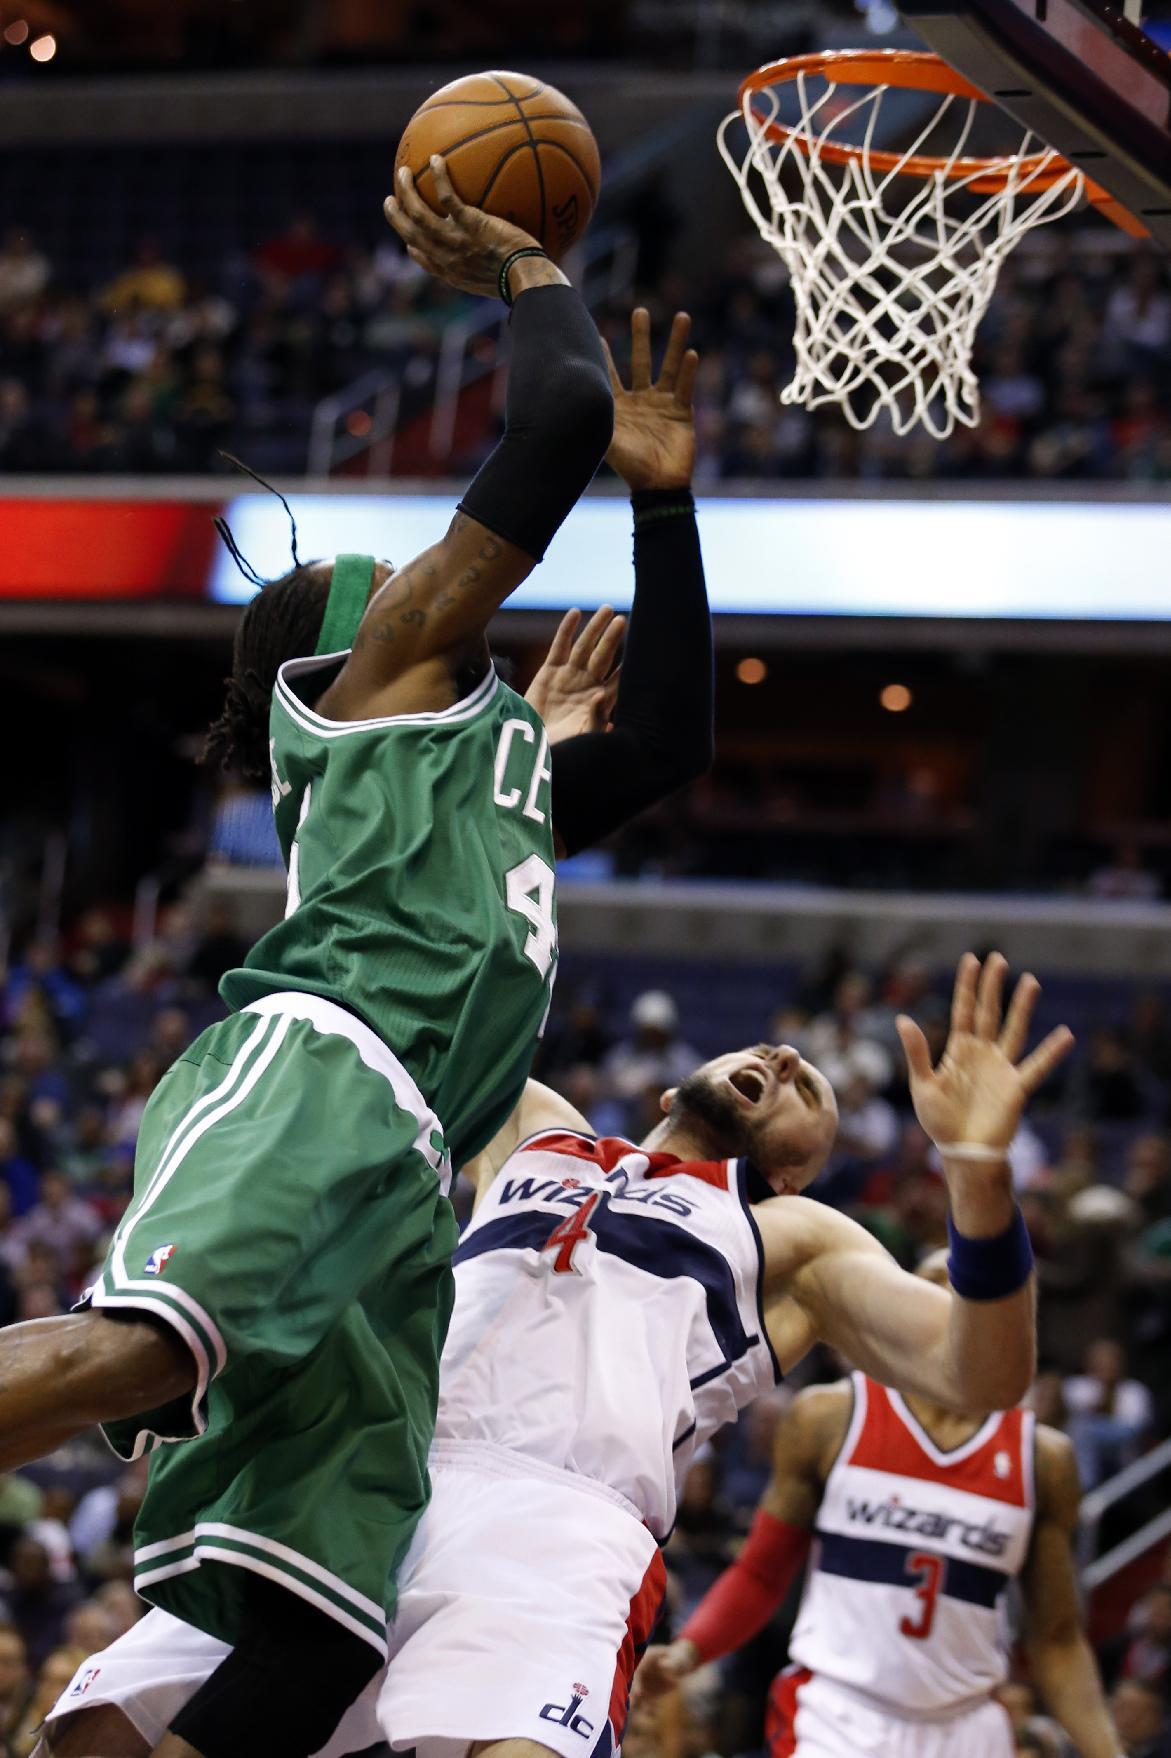 Undermanned Celtics beat Wizards 113-111 in OT